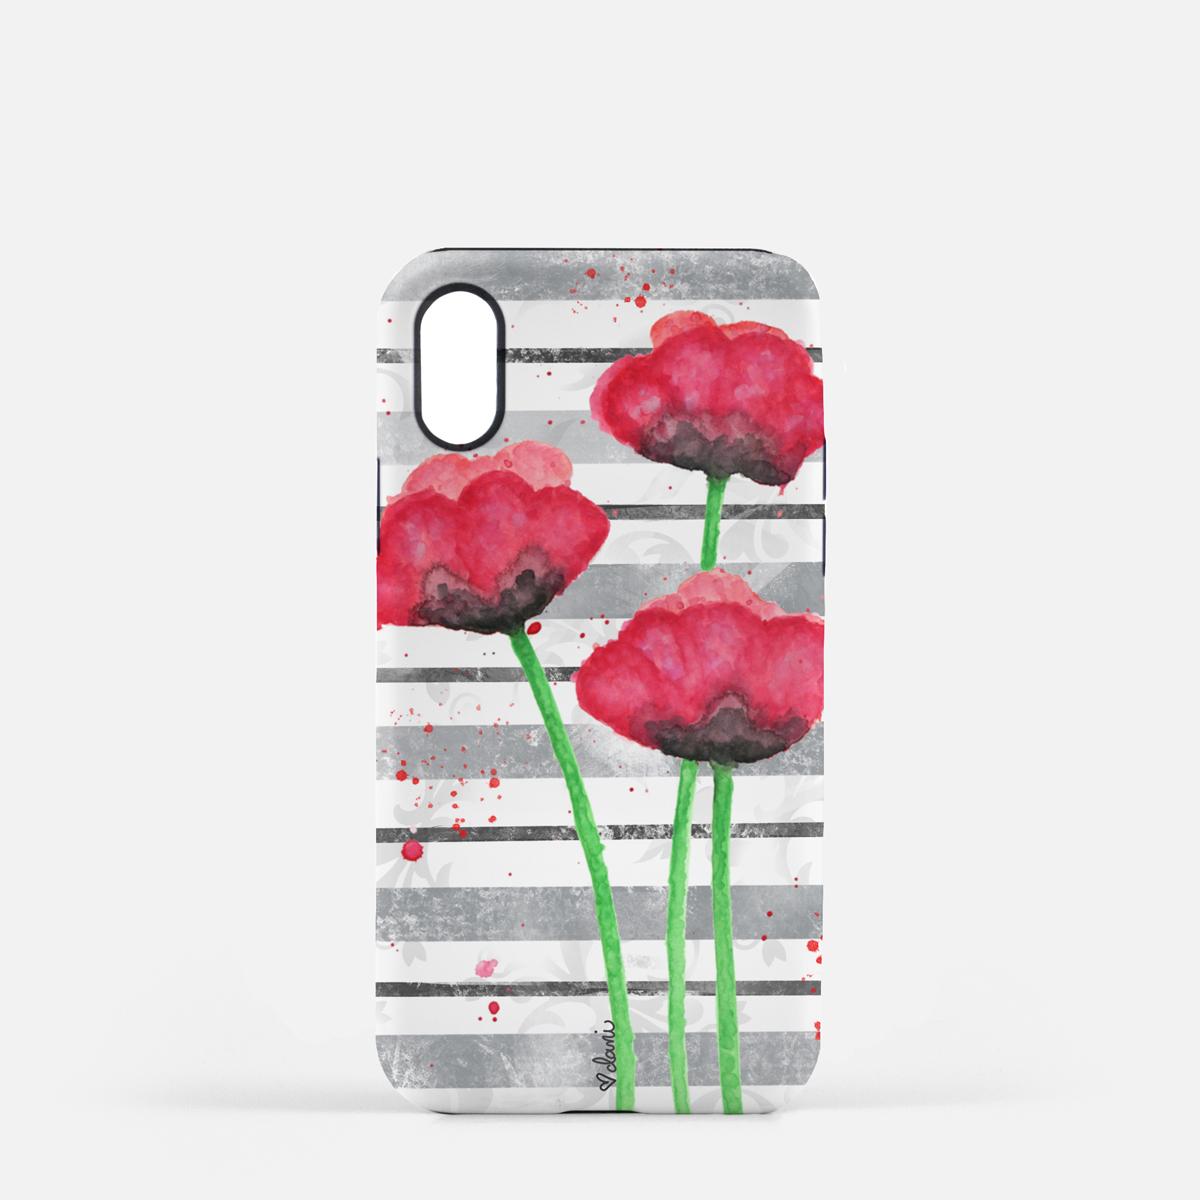 poppies_iphoneXCase.jpg